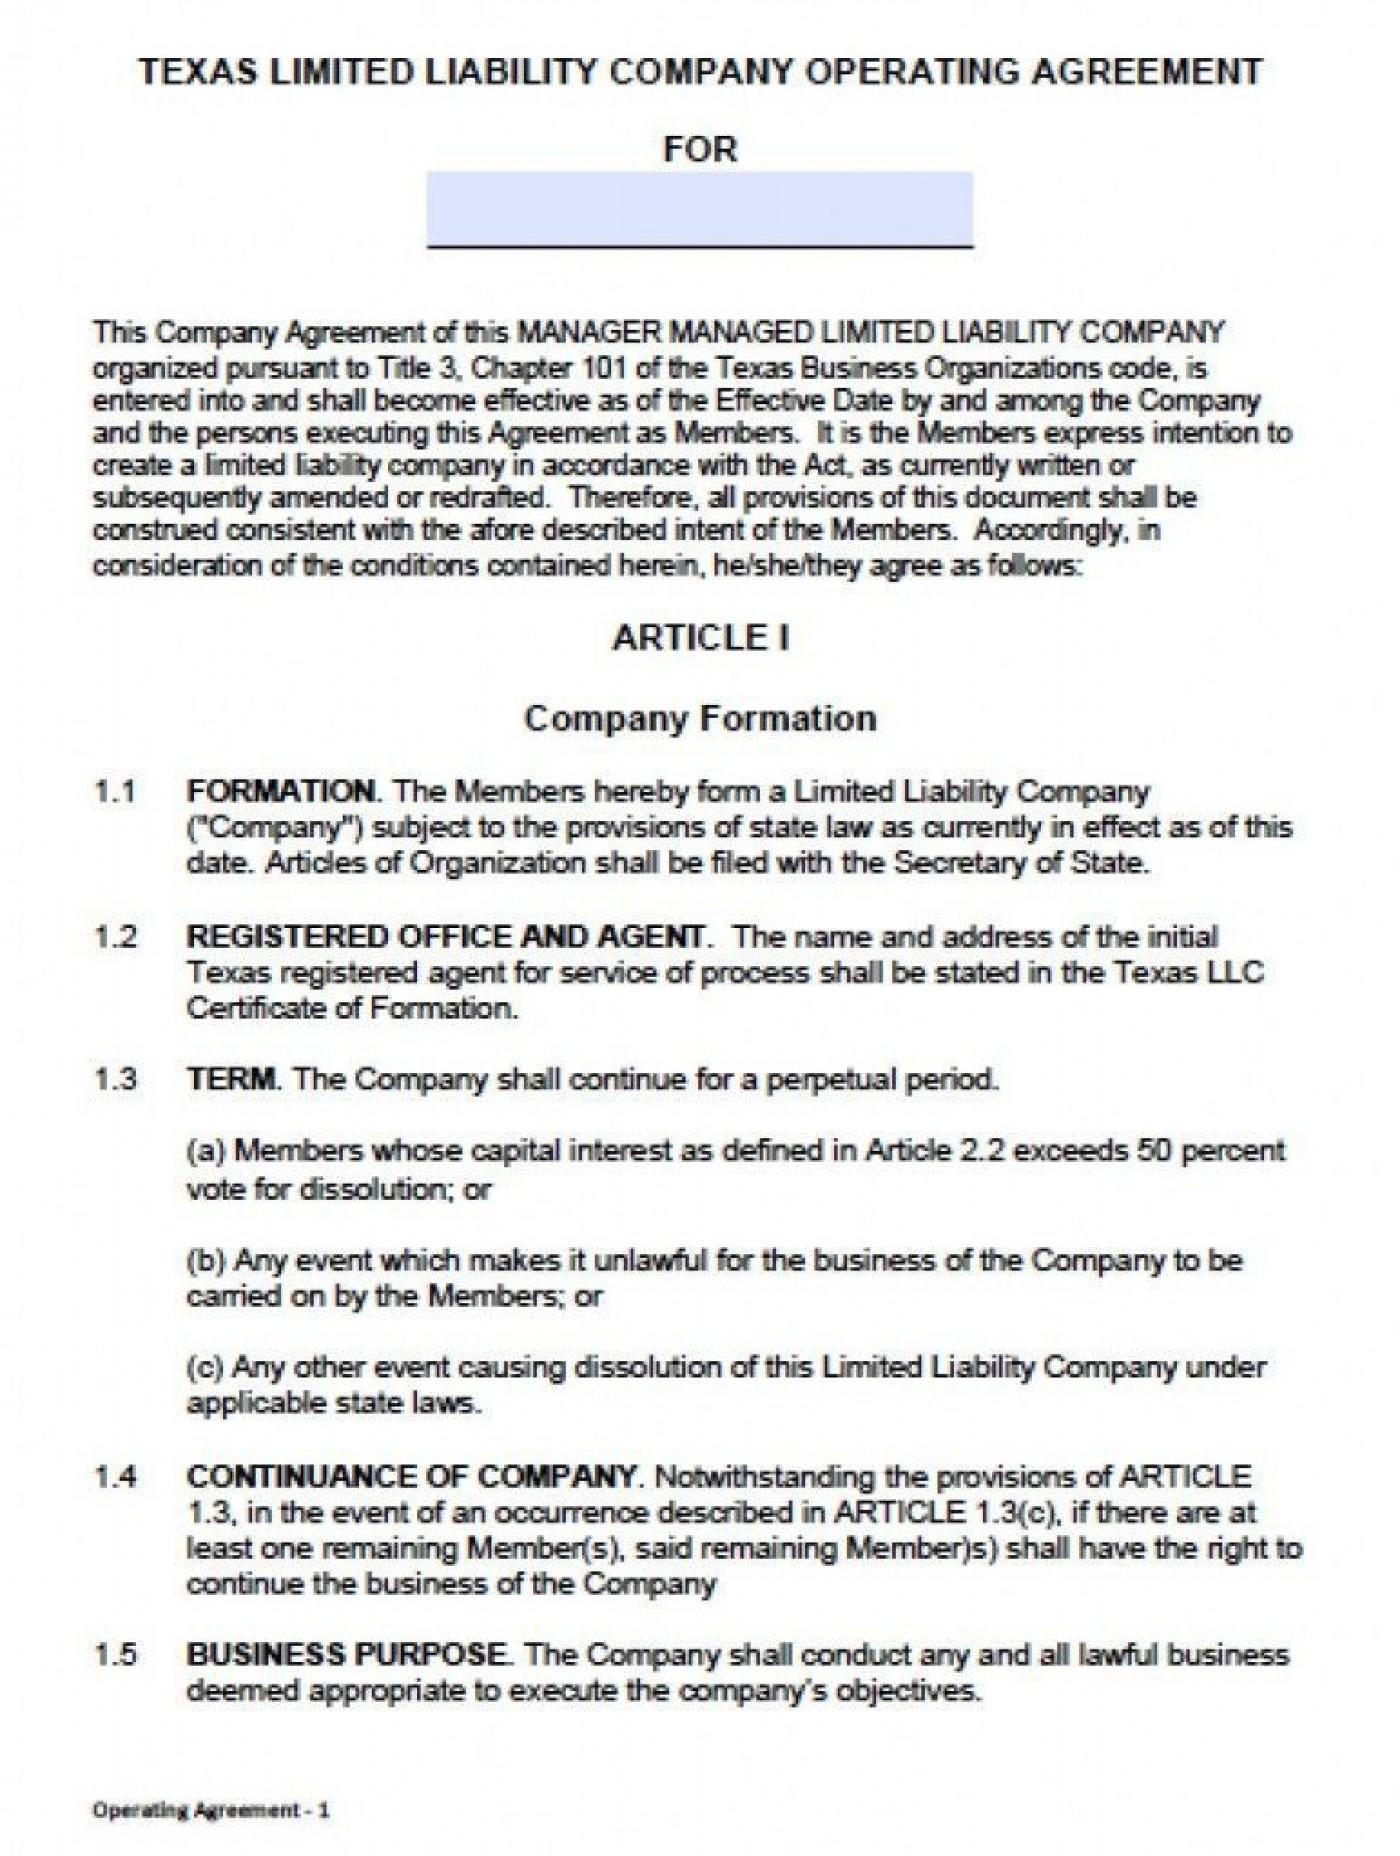 000 Frightening Operation Agreement Llc Template High Resolution  Operating Florida Indiana Single Member California1400